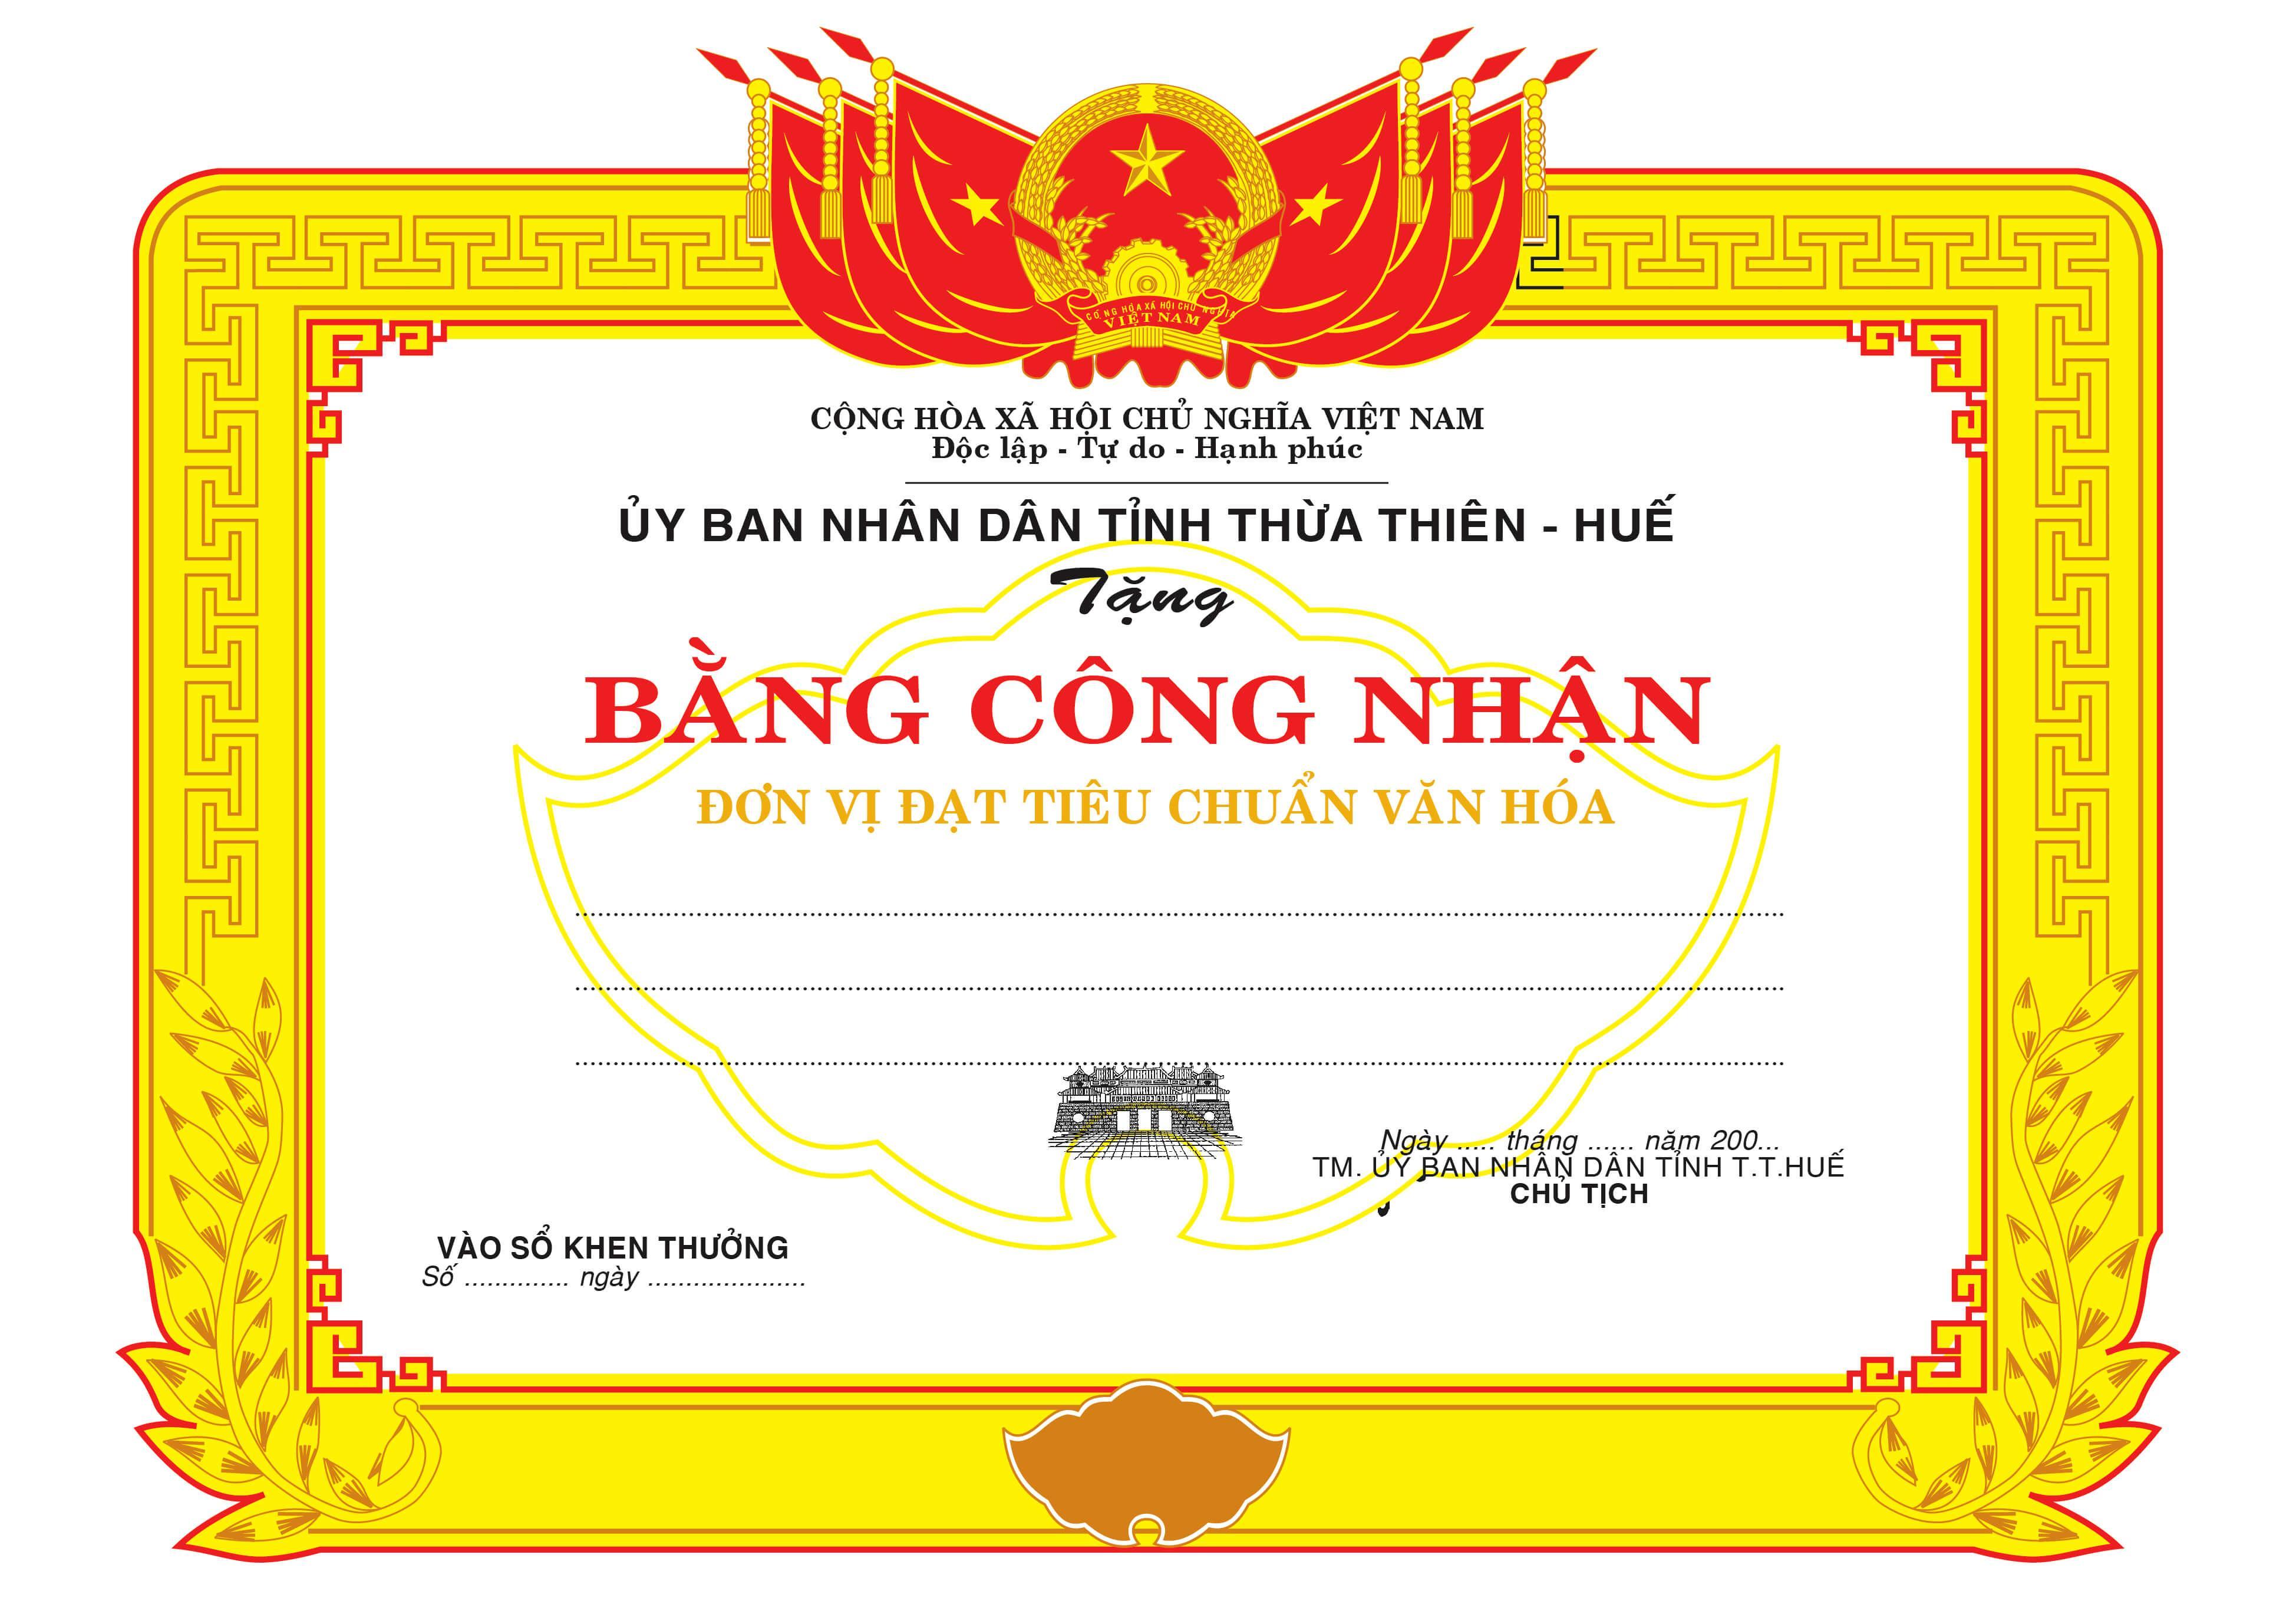 Mẫu giấy khen 056 - Giấy khen UBND - link download : https://adsnew.net/KuCMsI